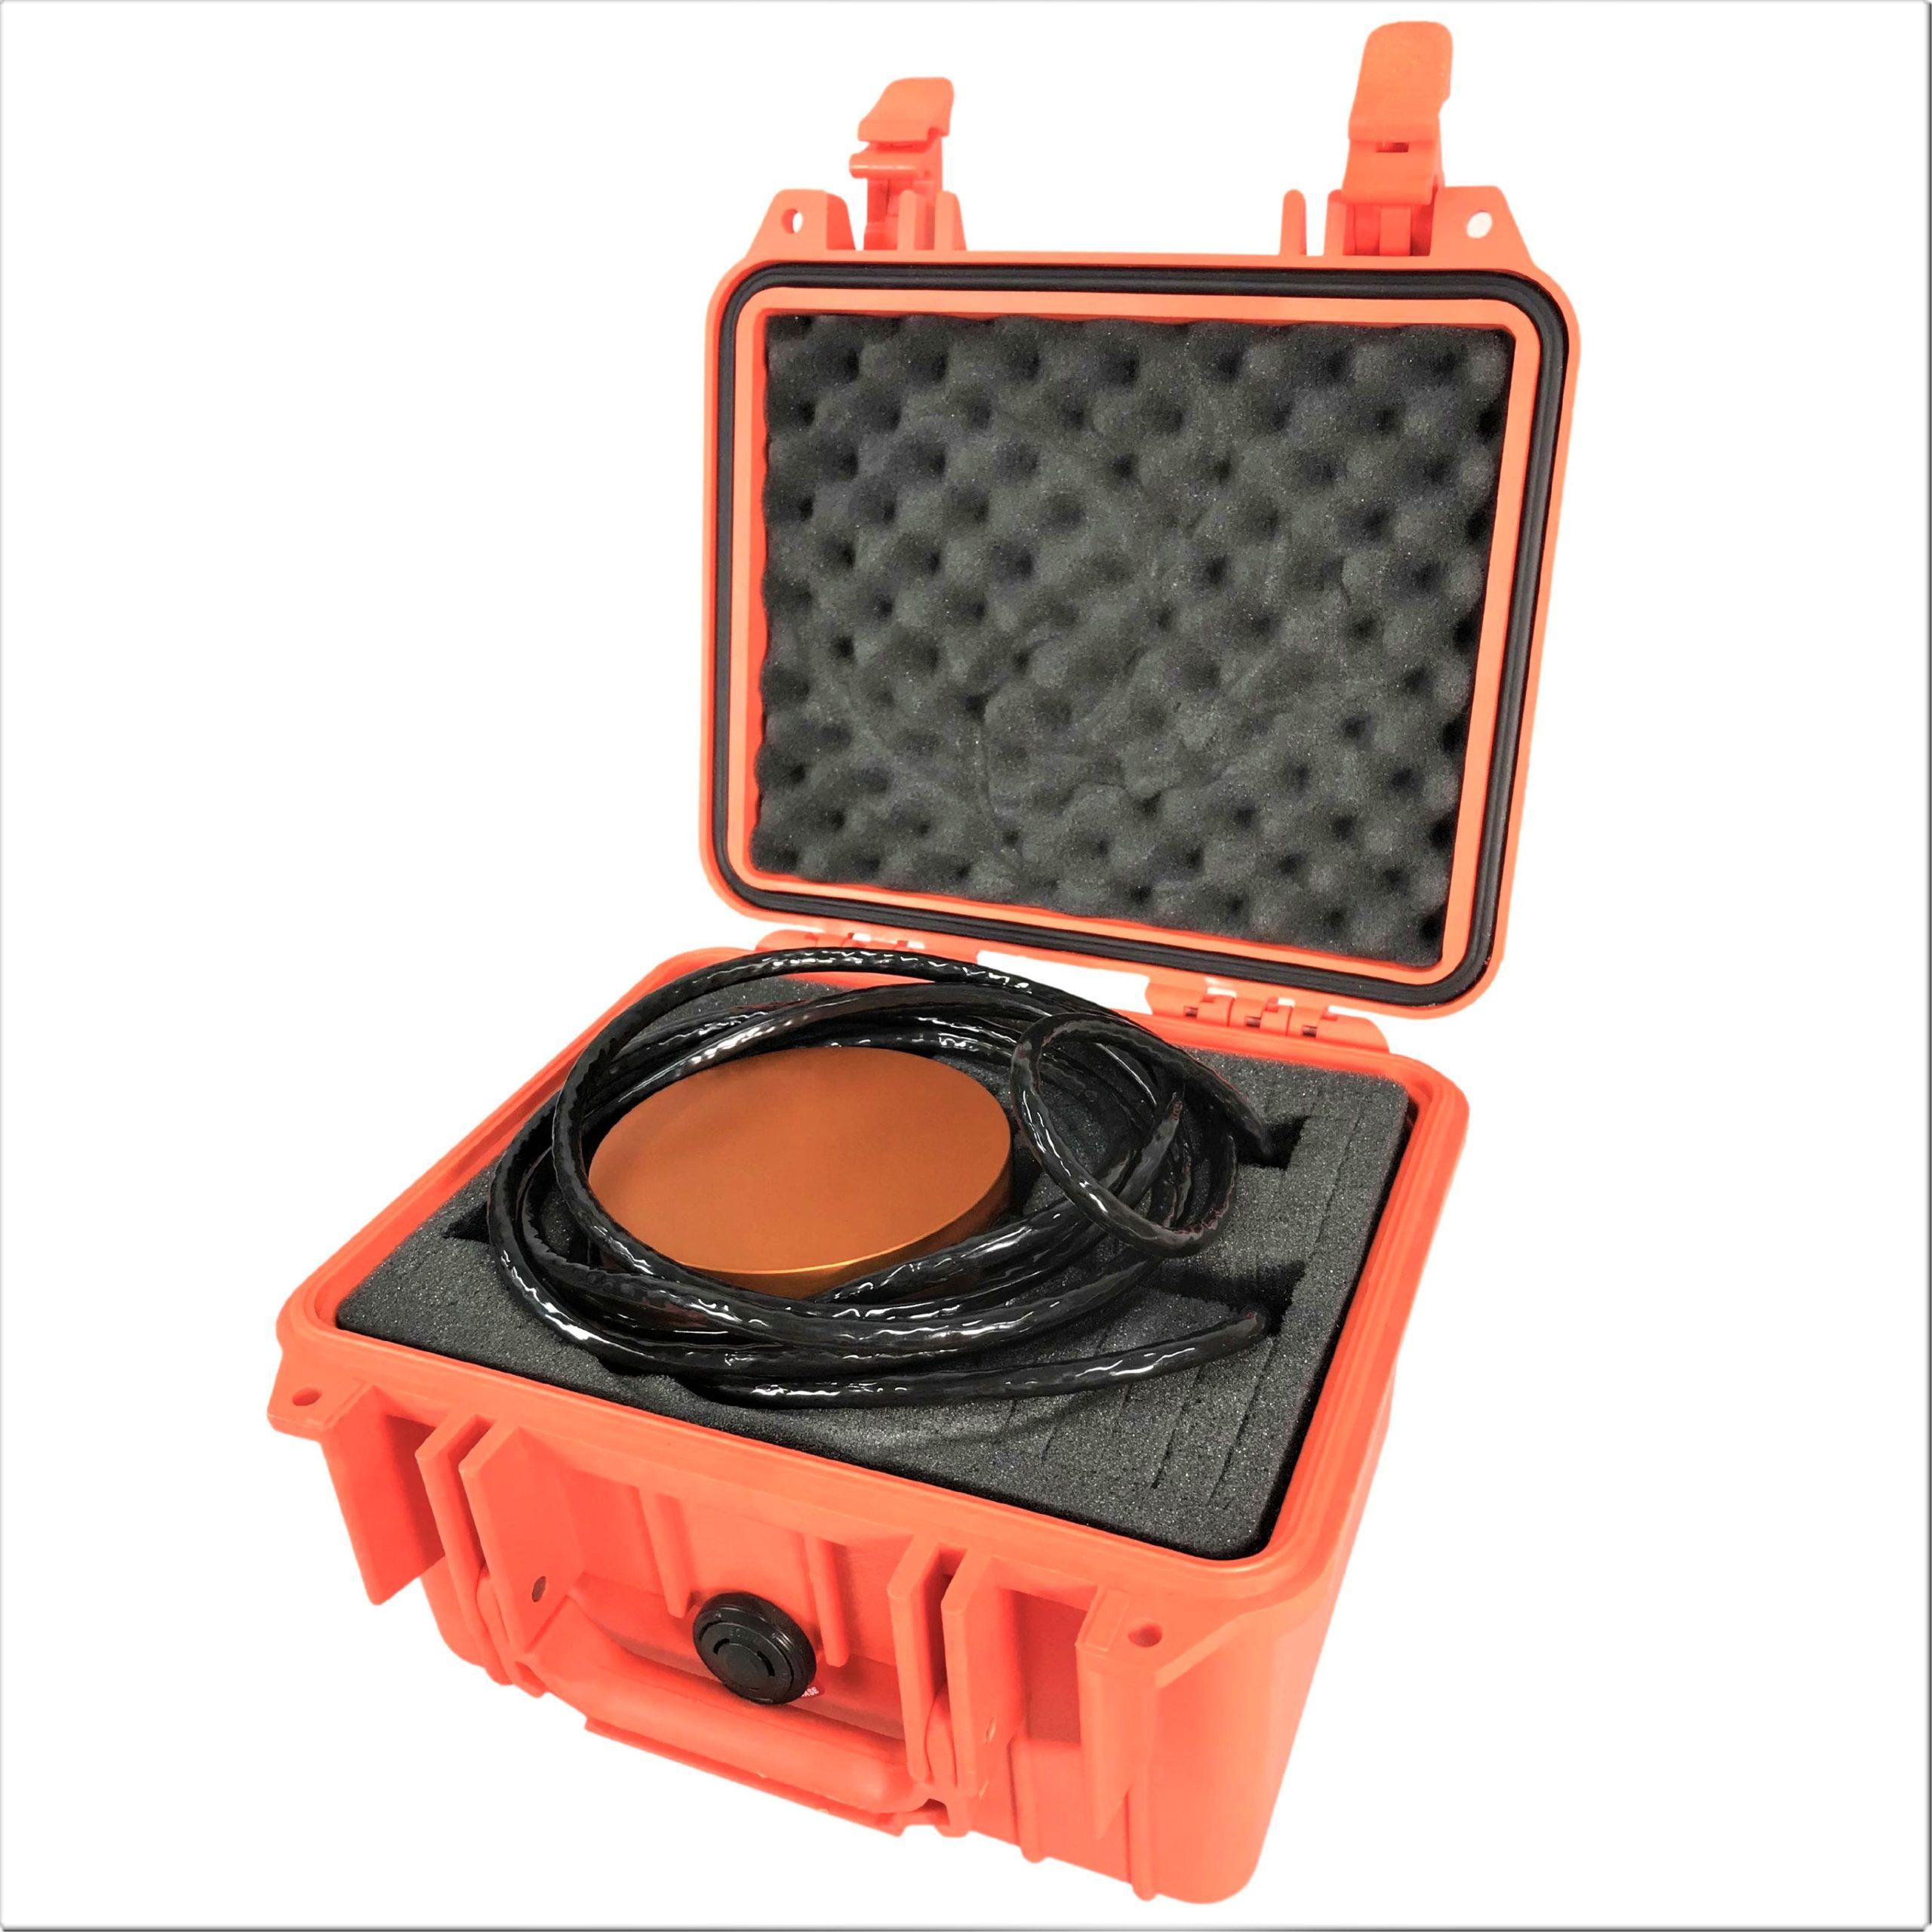 PTM instrument in case